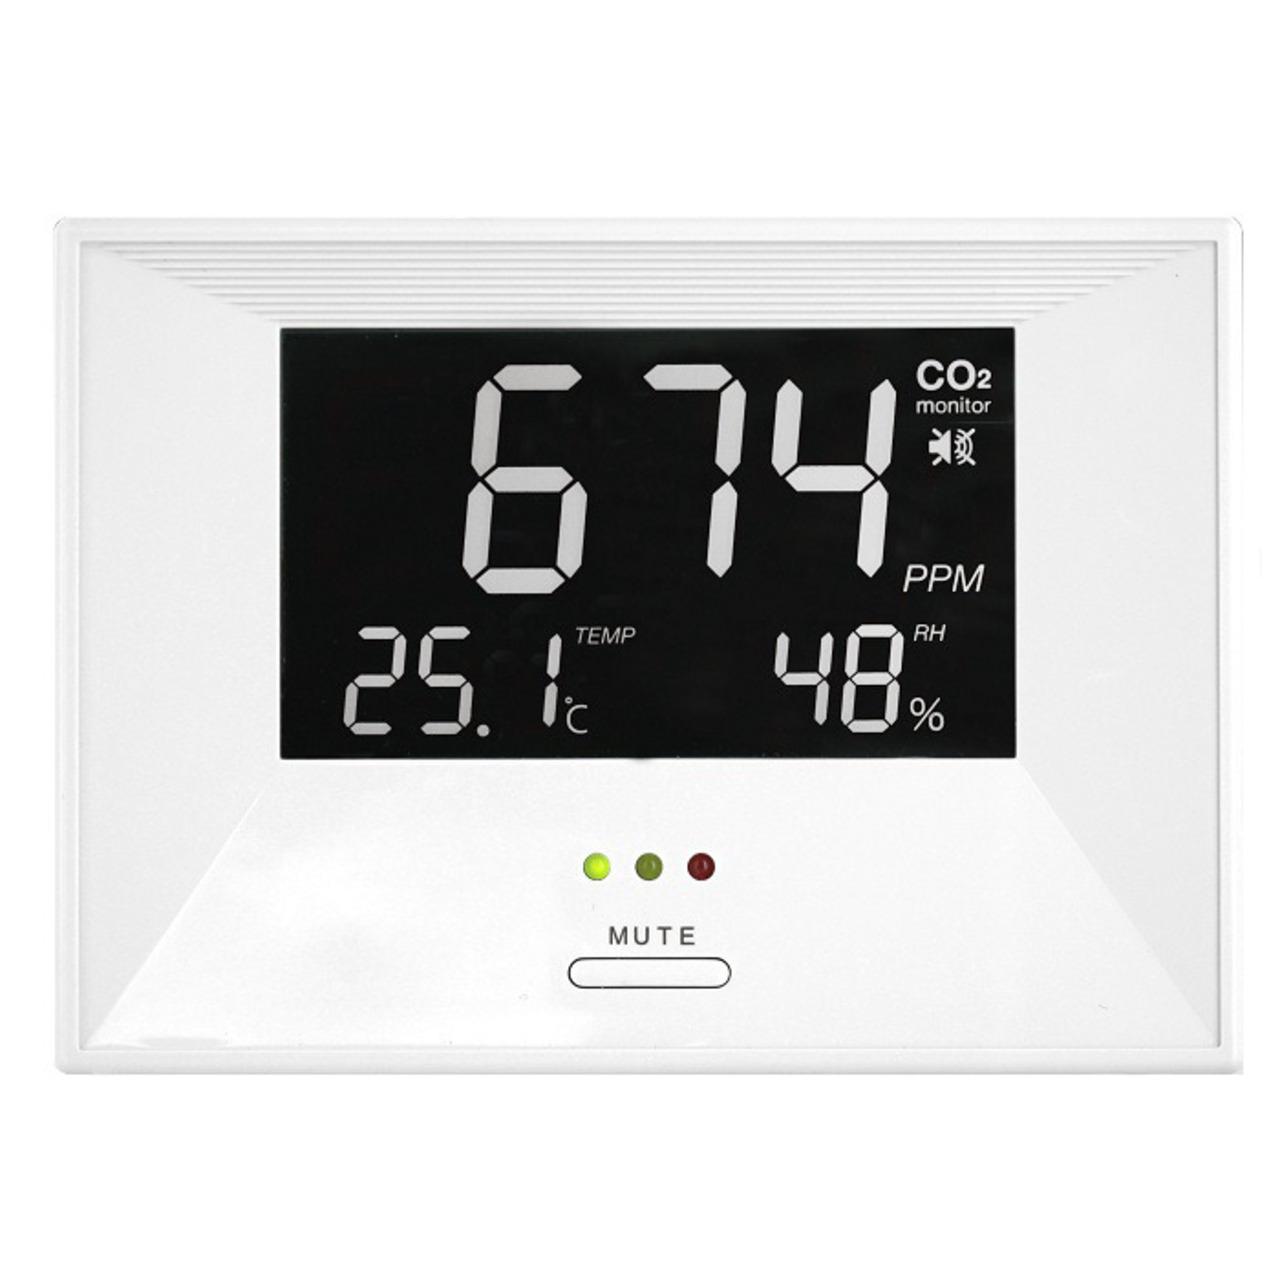 TFA CO2-Messgerät - CO2-Anzeige AirControl LIFE- Kohlendioxid- mit LED-Ampel und Alarm-Funktion